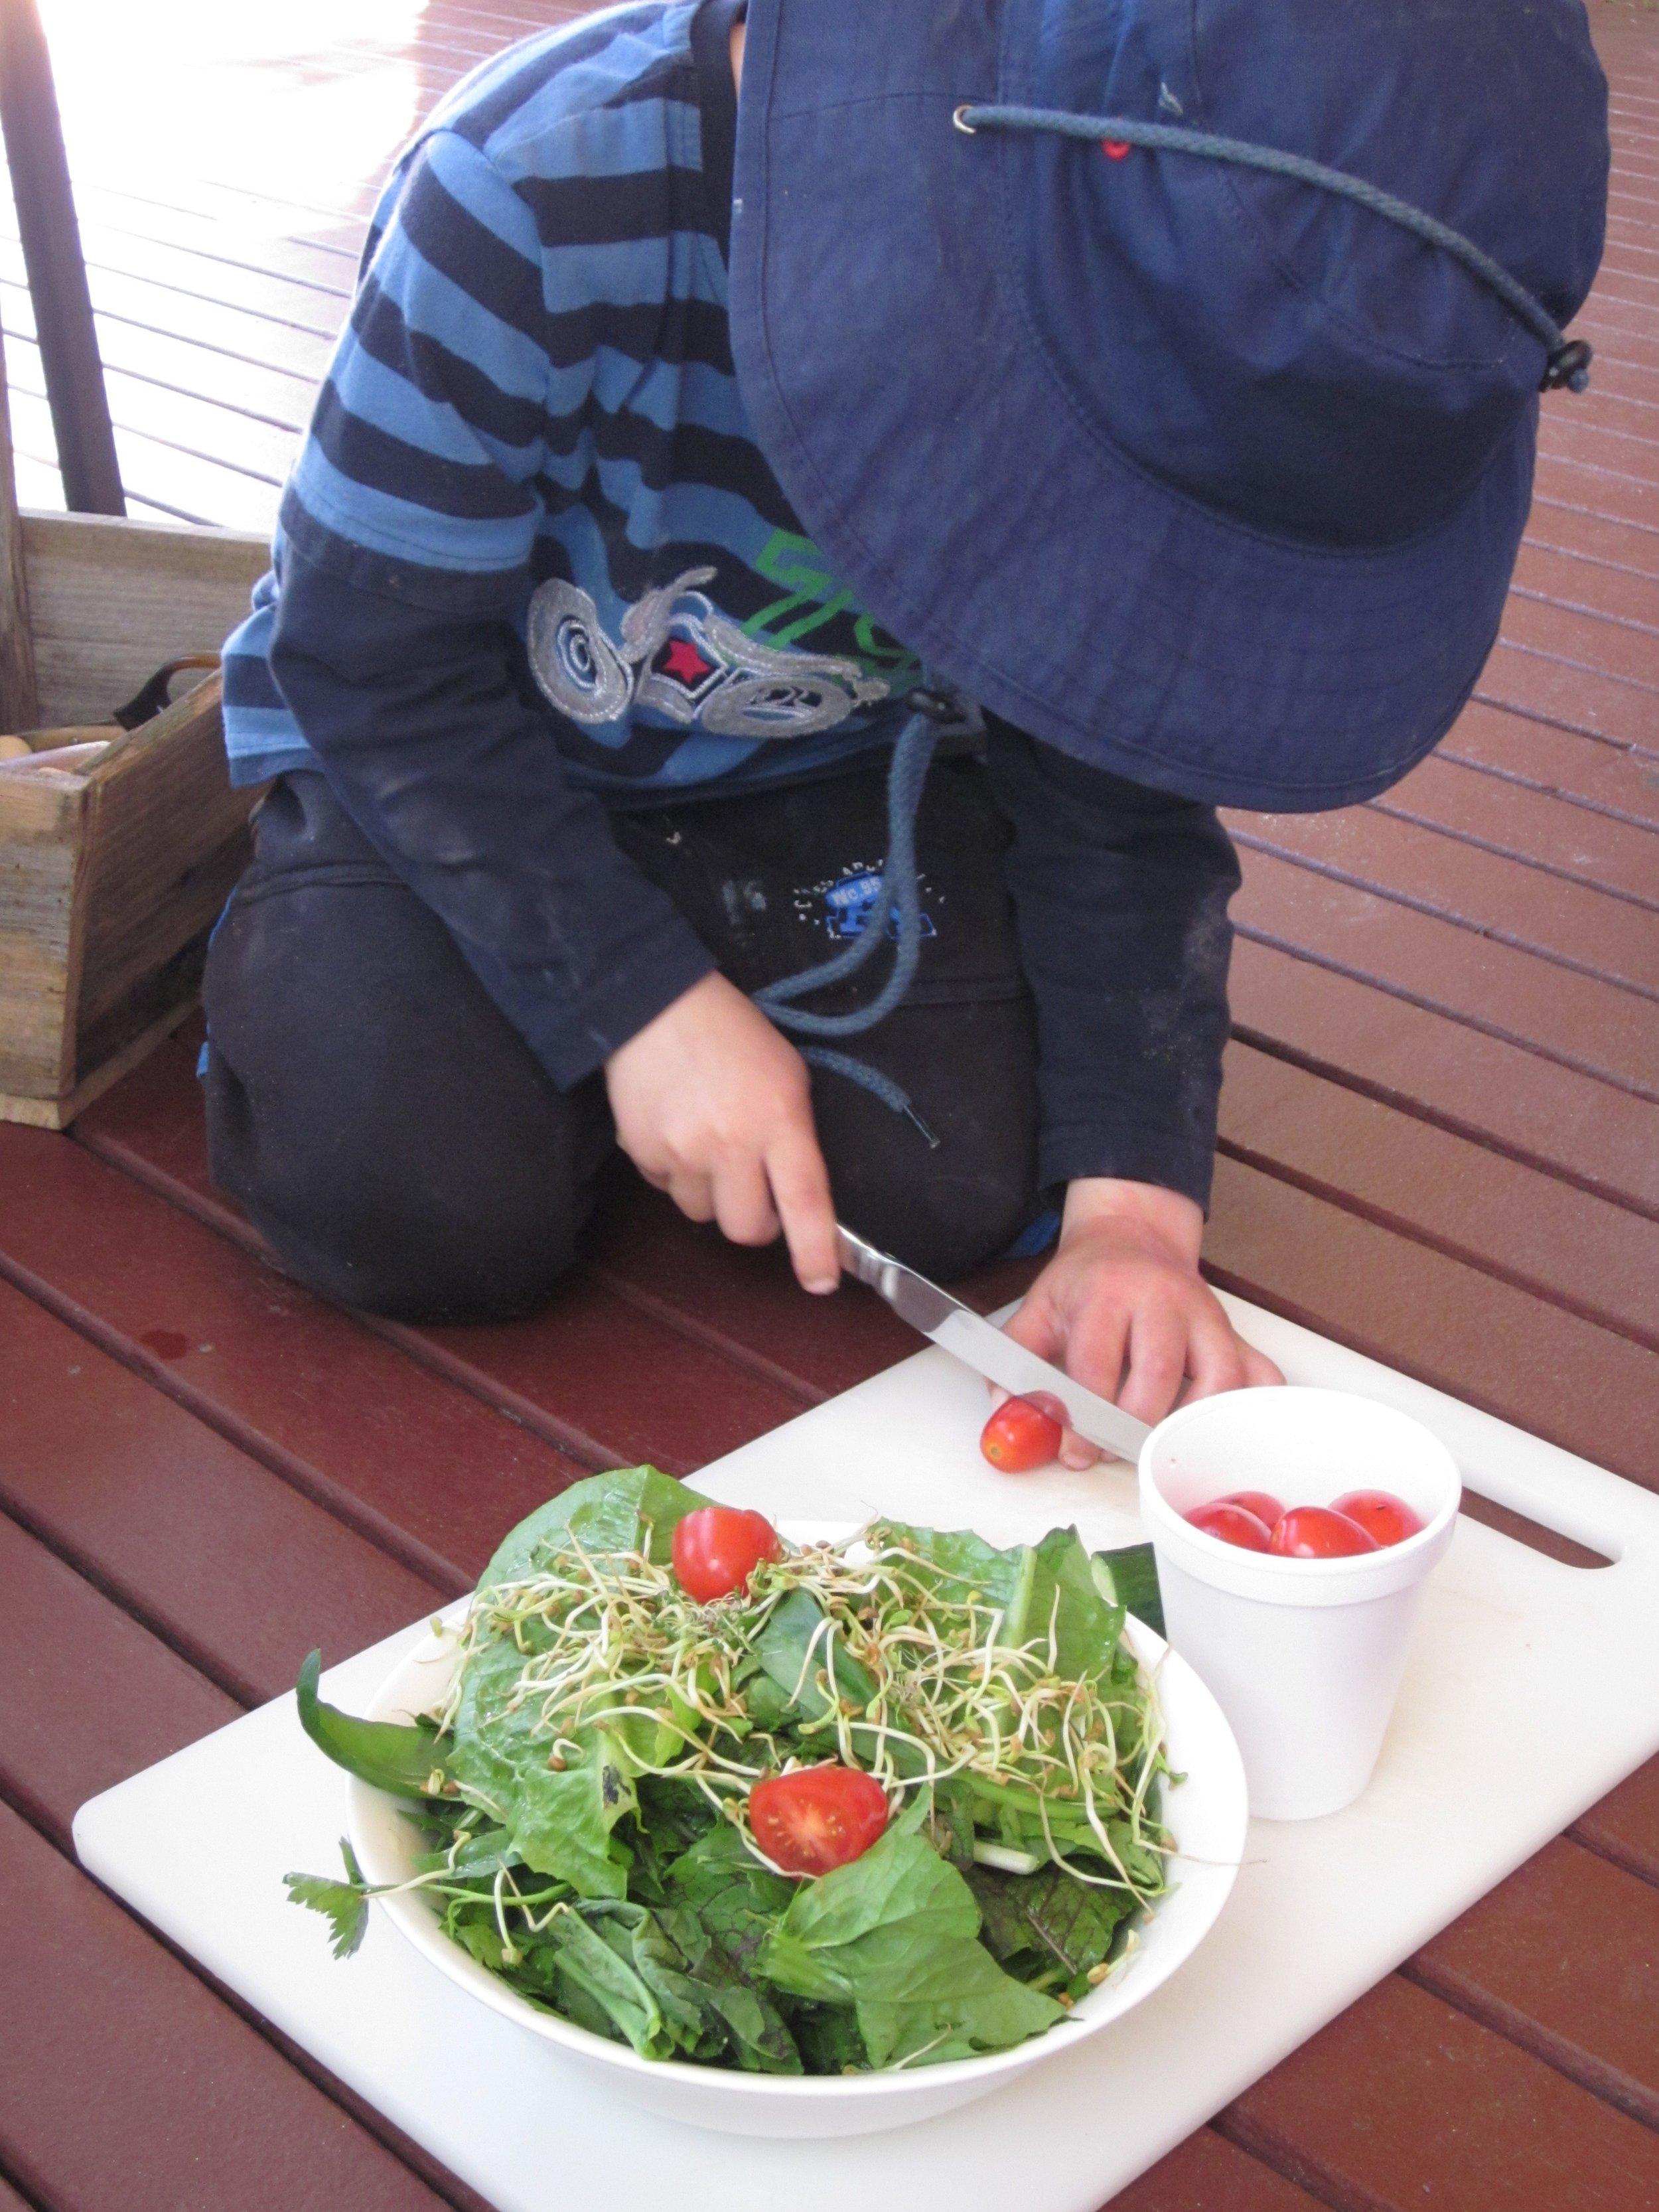 Chopping tomatoes.jpg